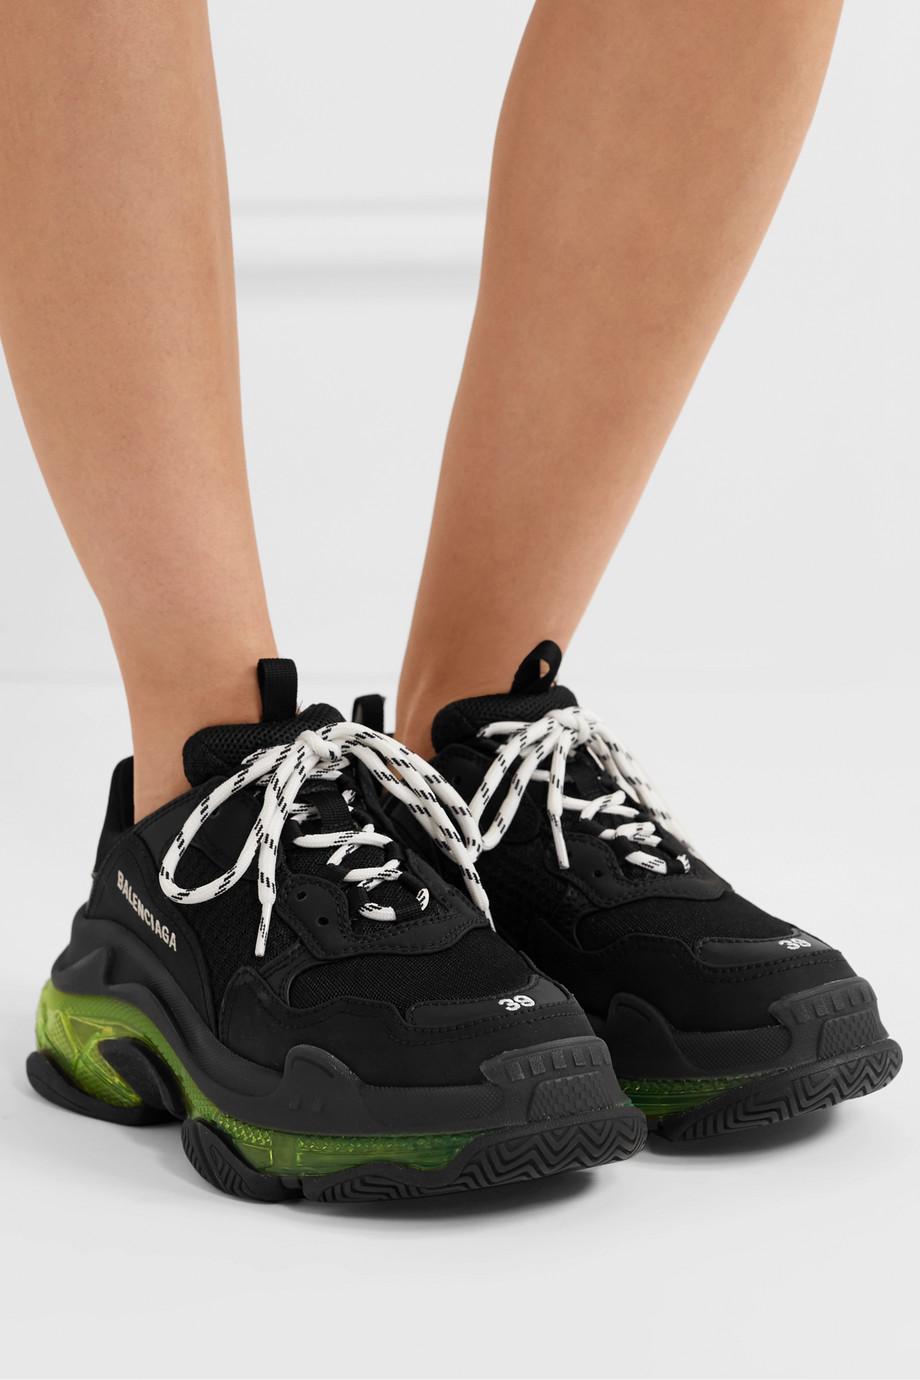 Balenciaga Triple S Clear Sole 品牌标志刺绣皮革牛巴革网眼运动鞋